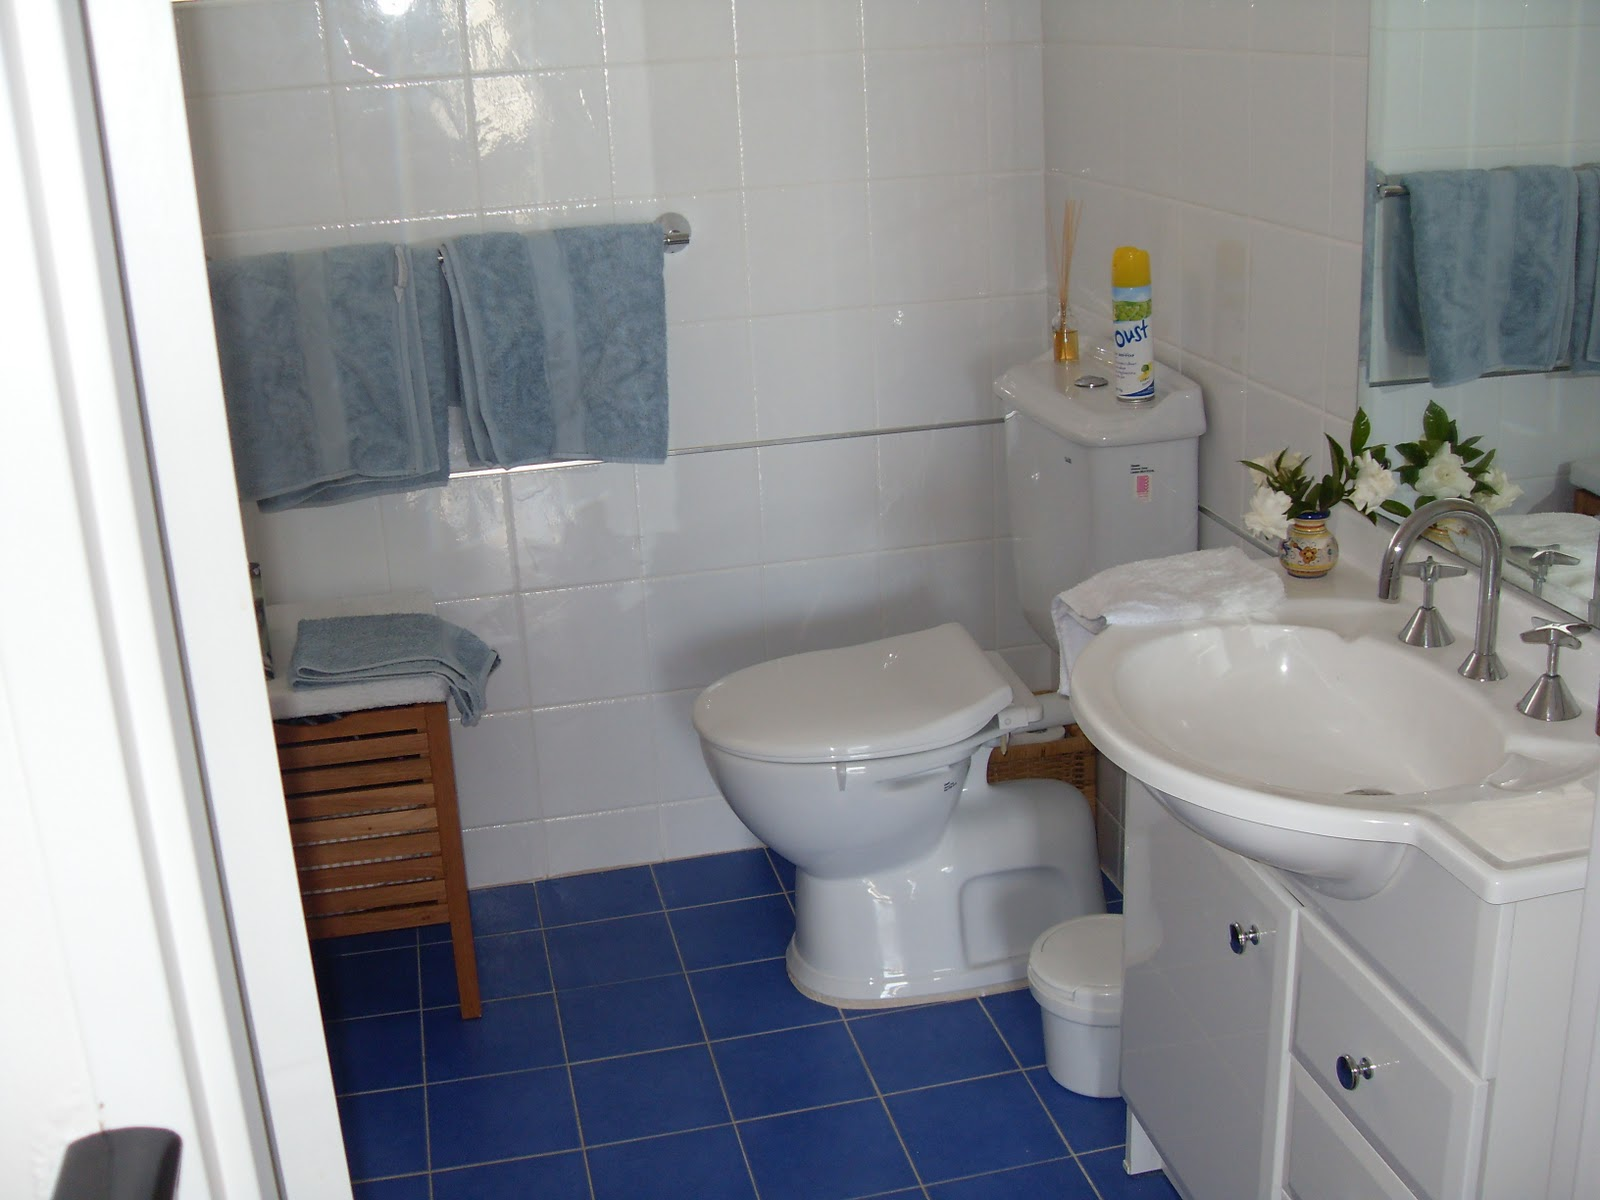 Bathroom Tile Flooring Have Never Liked My S Blue Floor Tiles